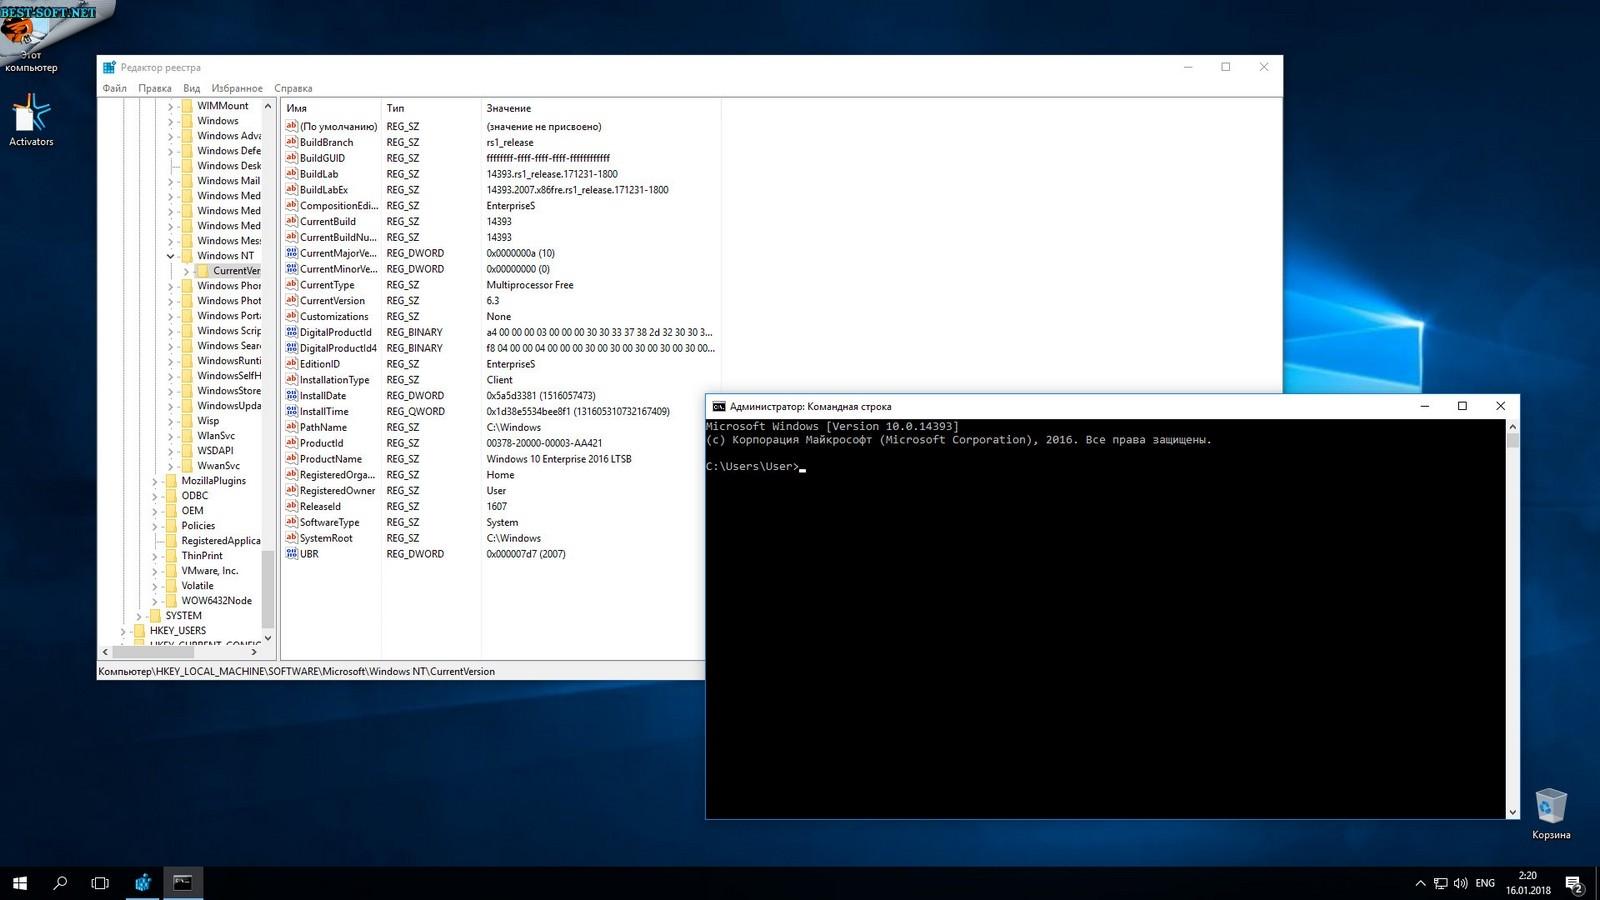 Windows 10 enterprise ltsb x64 msdn